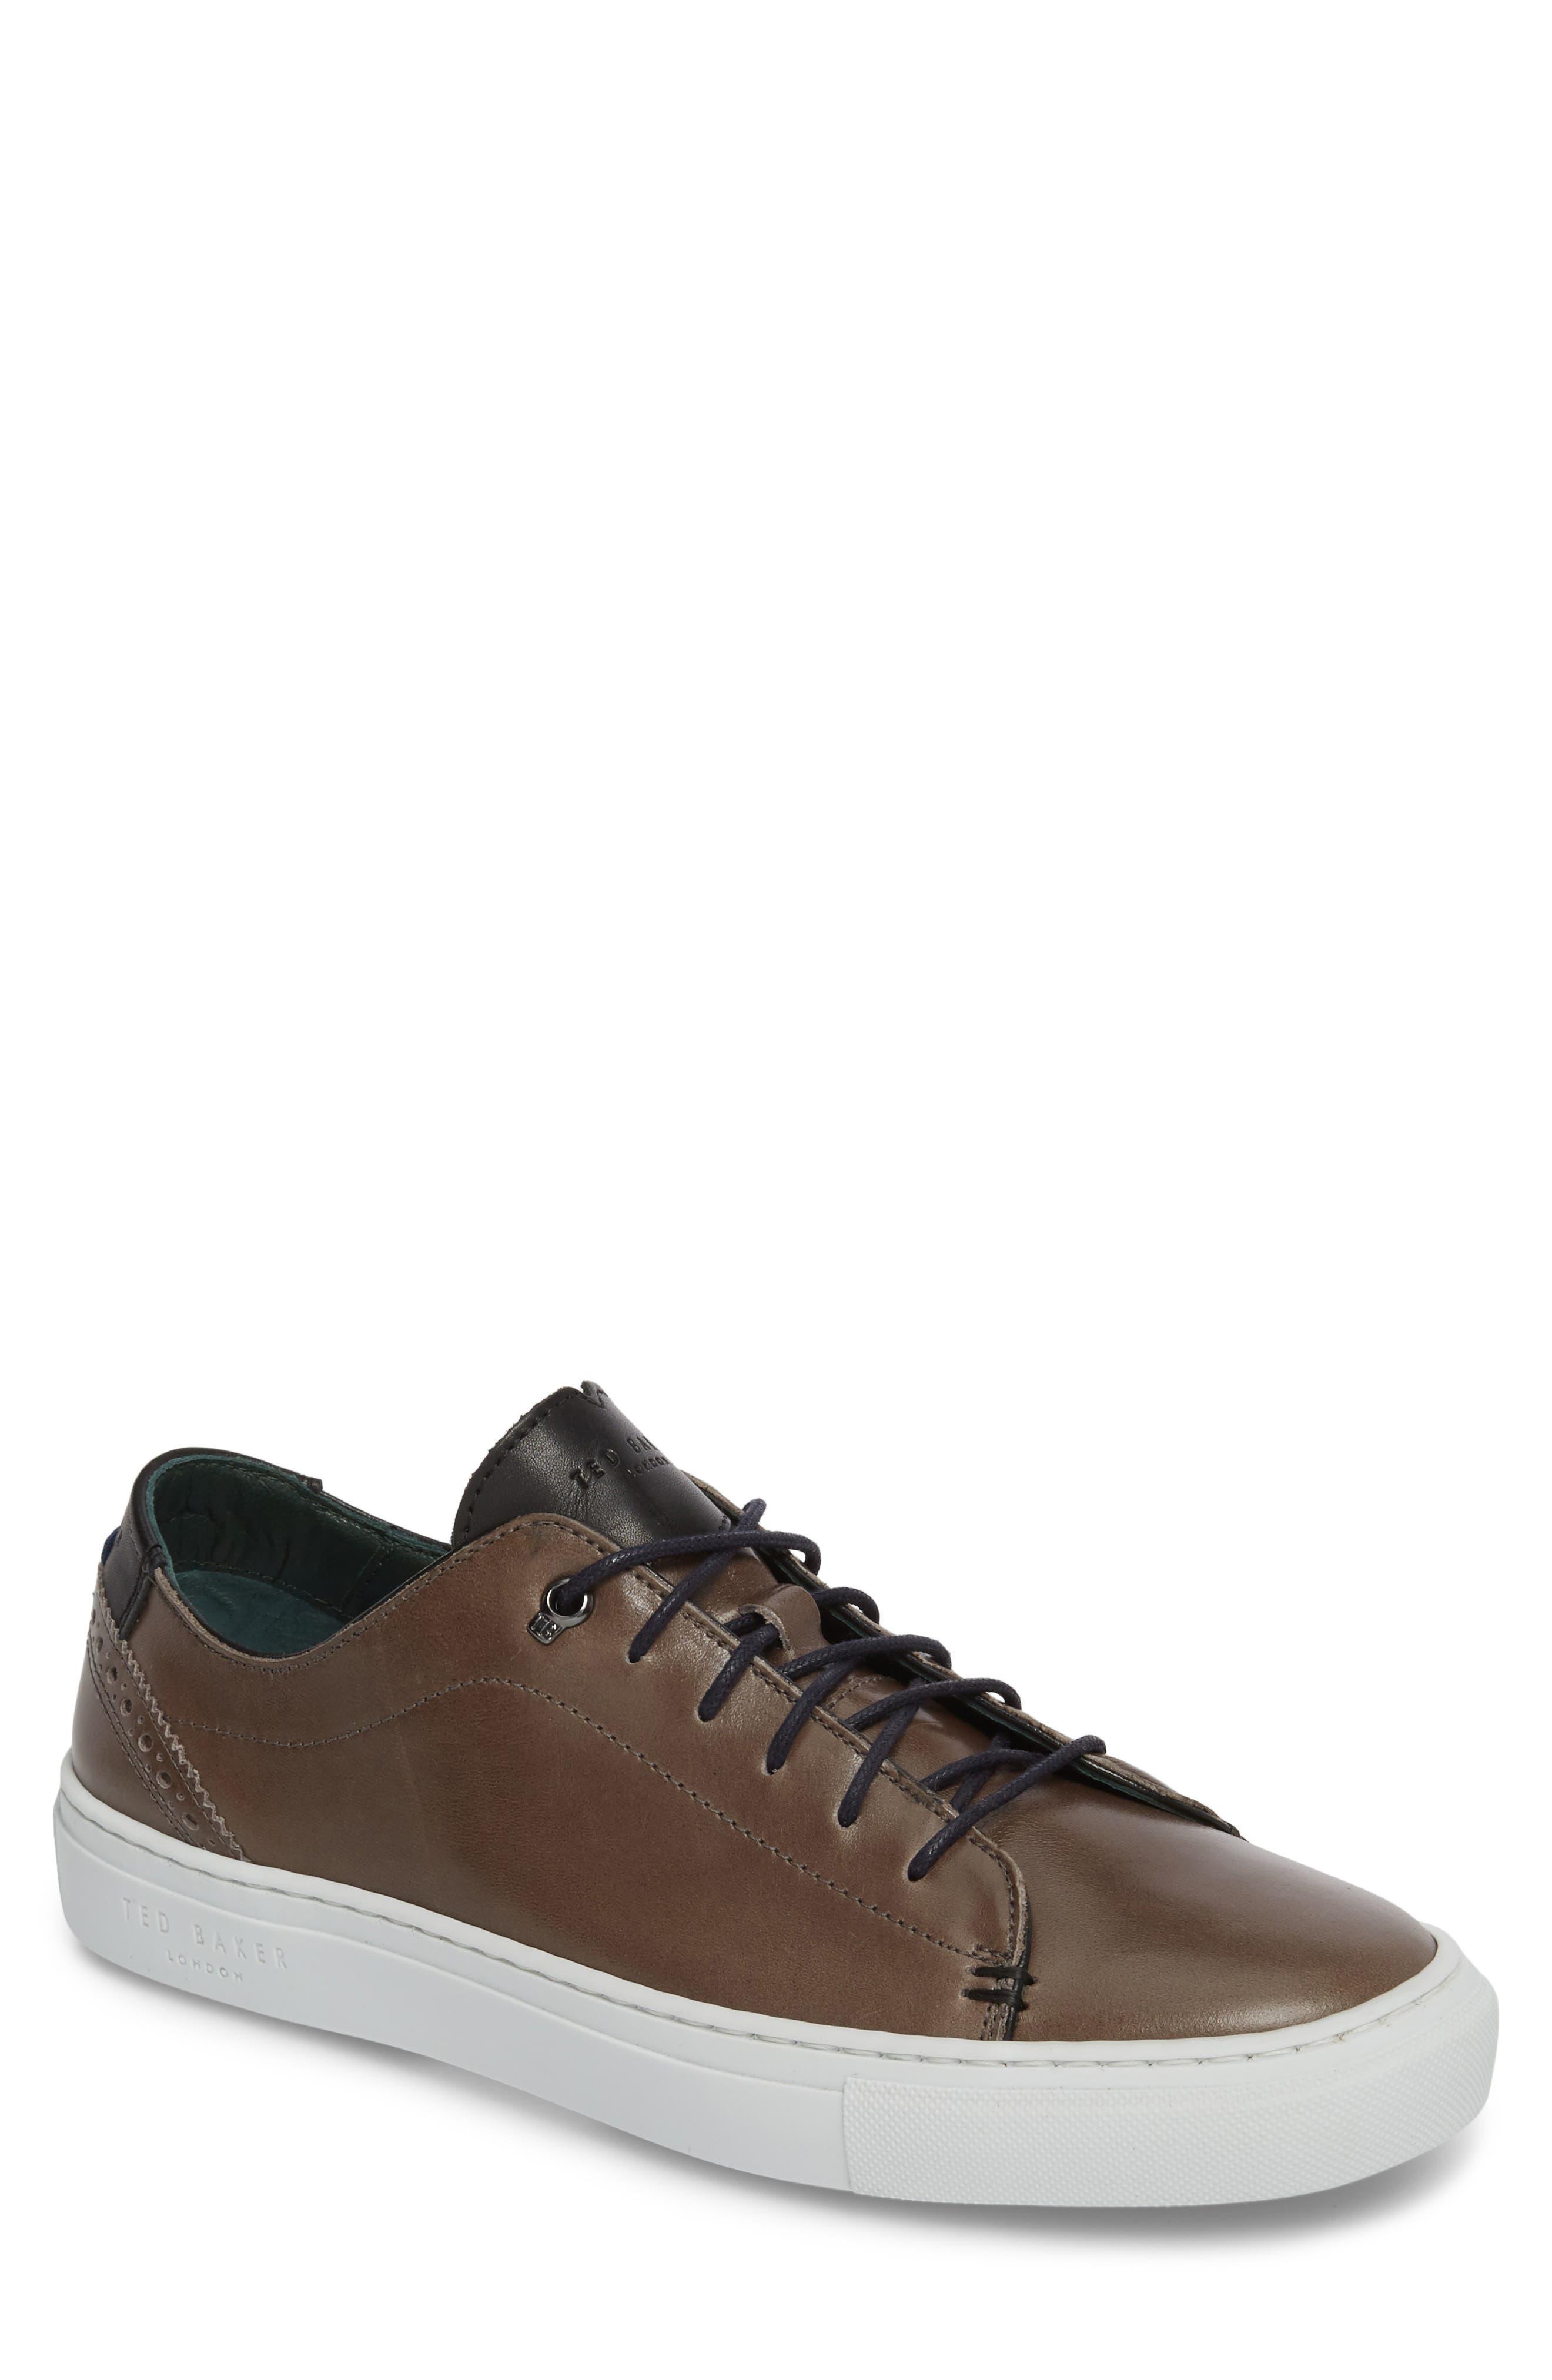 Duuke 2 Sneaker,                             Main thumbnail 1, color,                             028